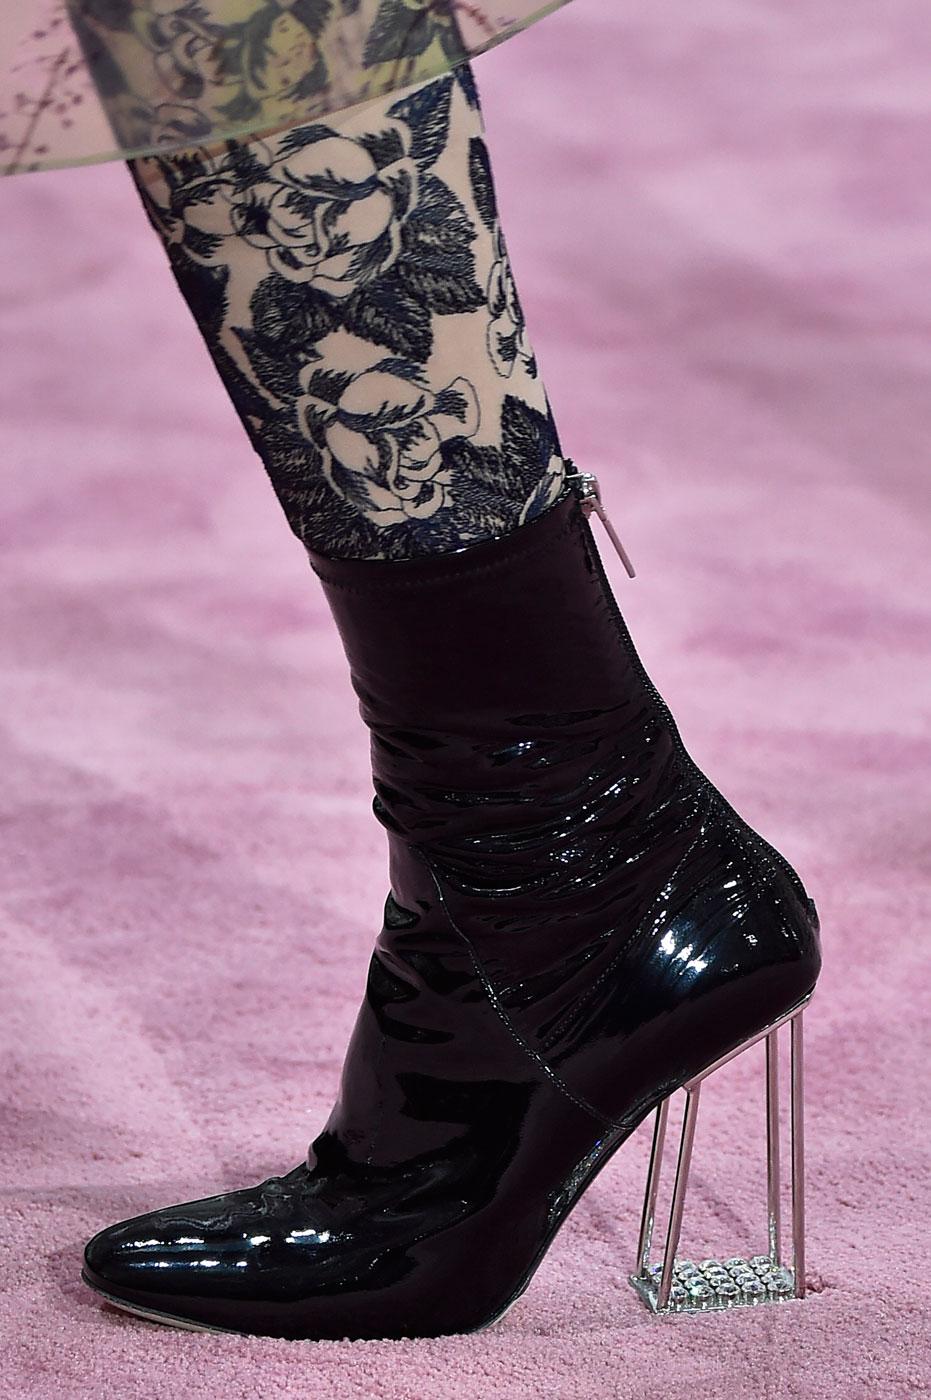 Christian-Dior-fashion-runway-show-close-ups-haute-couture-paris-spring-summer-2015-the-impression-167